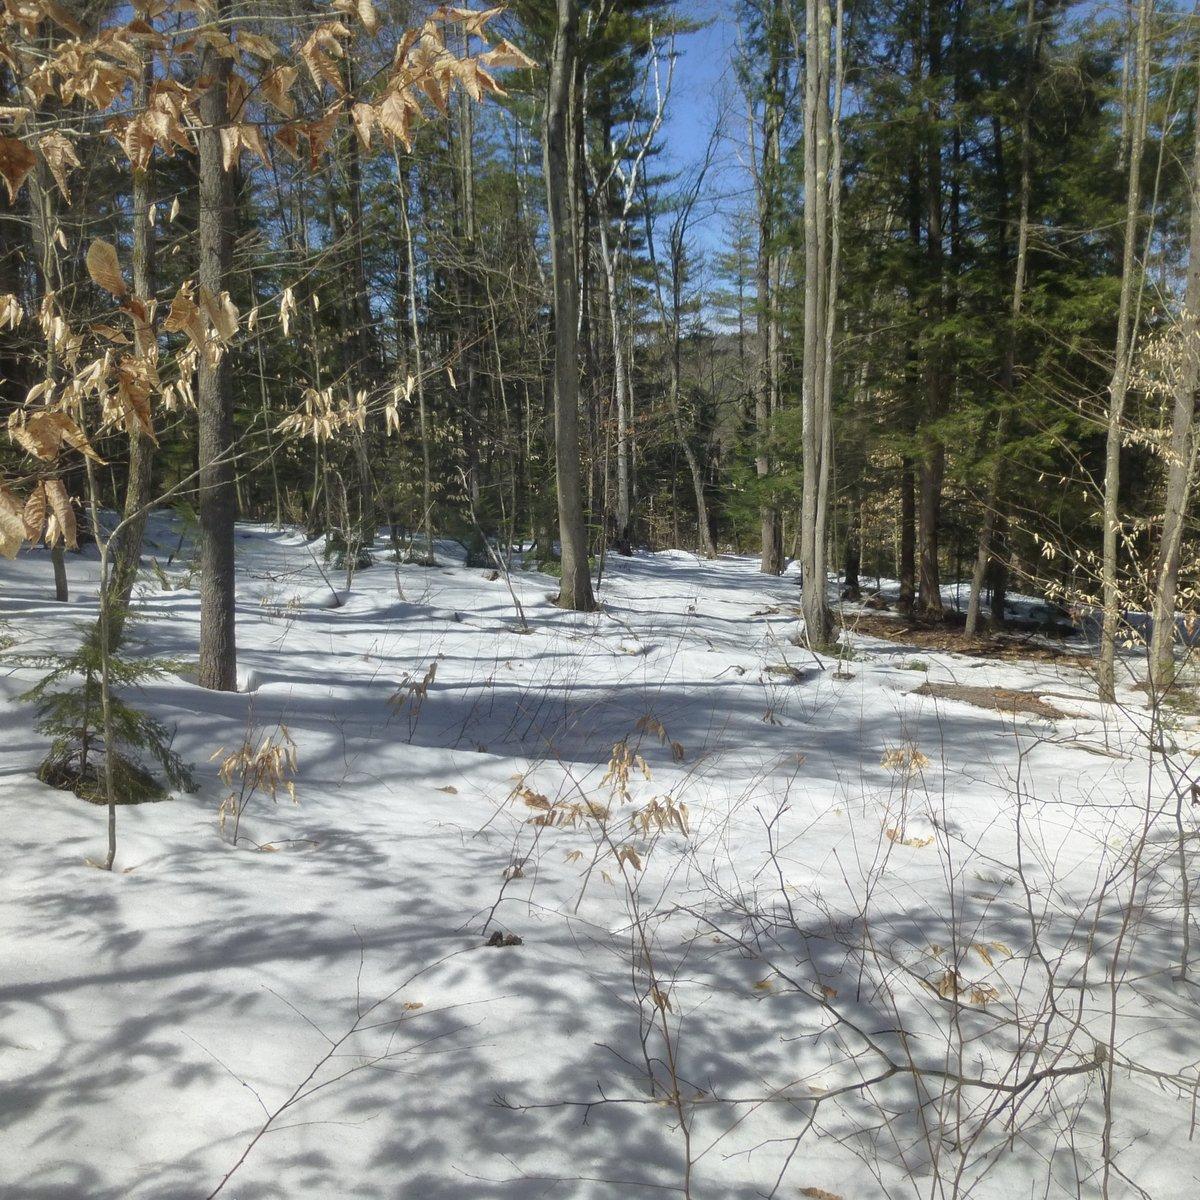 2. Snowy Woods